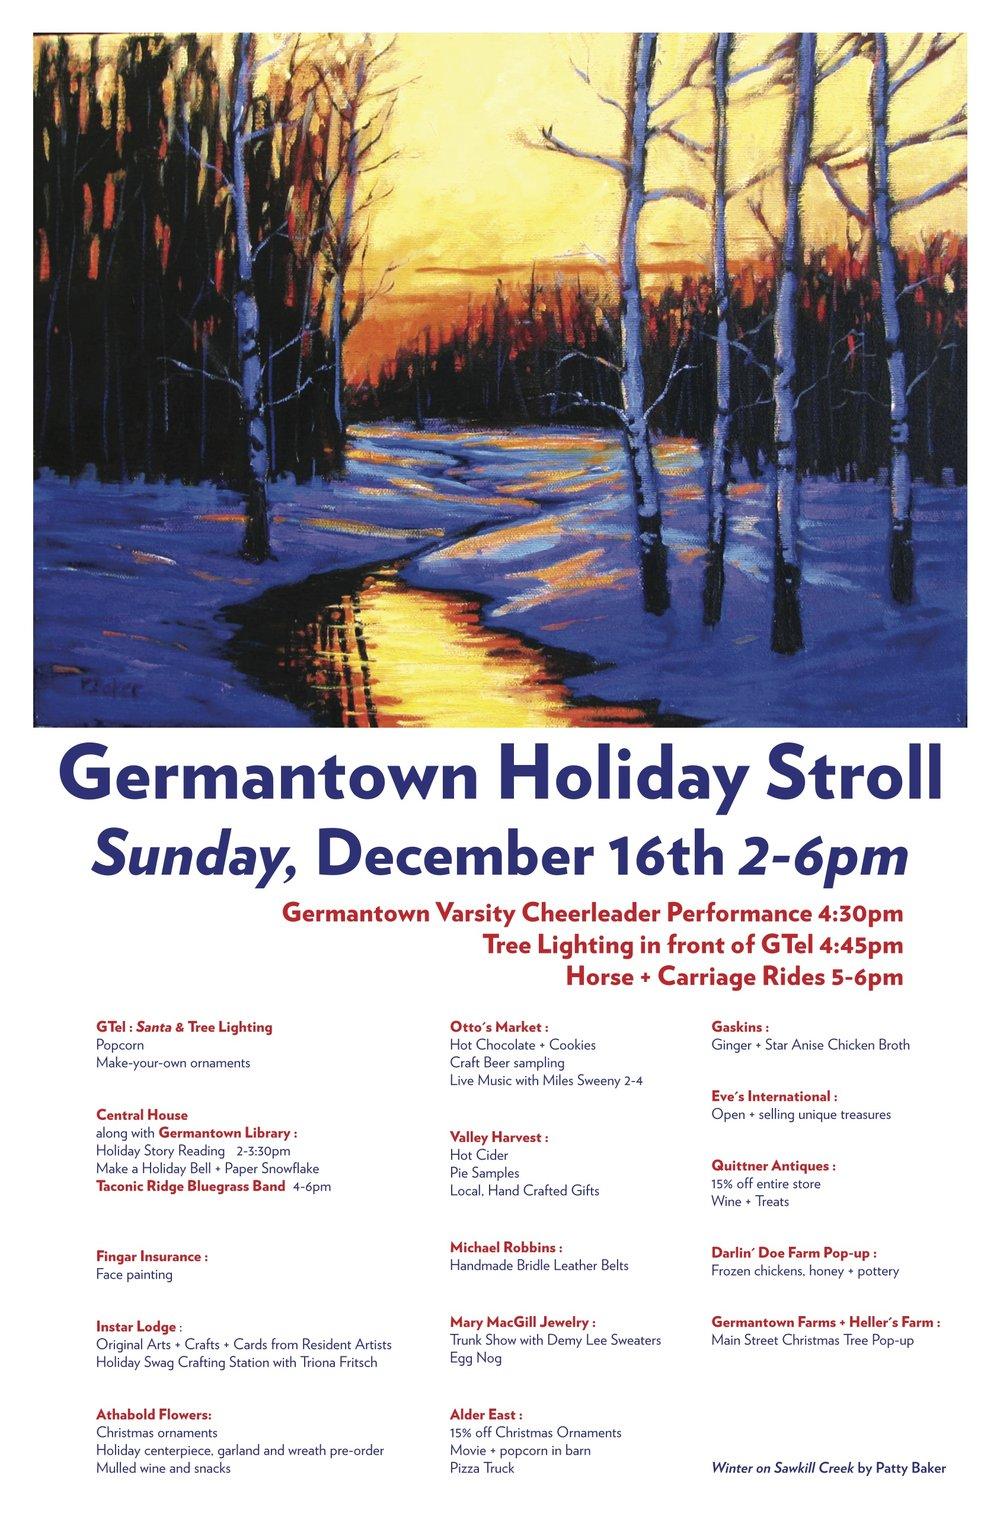 Germantown Holiday Stroll Poster.jpg